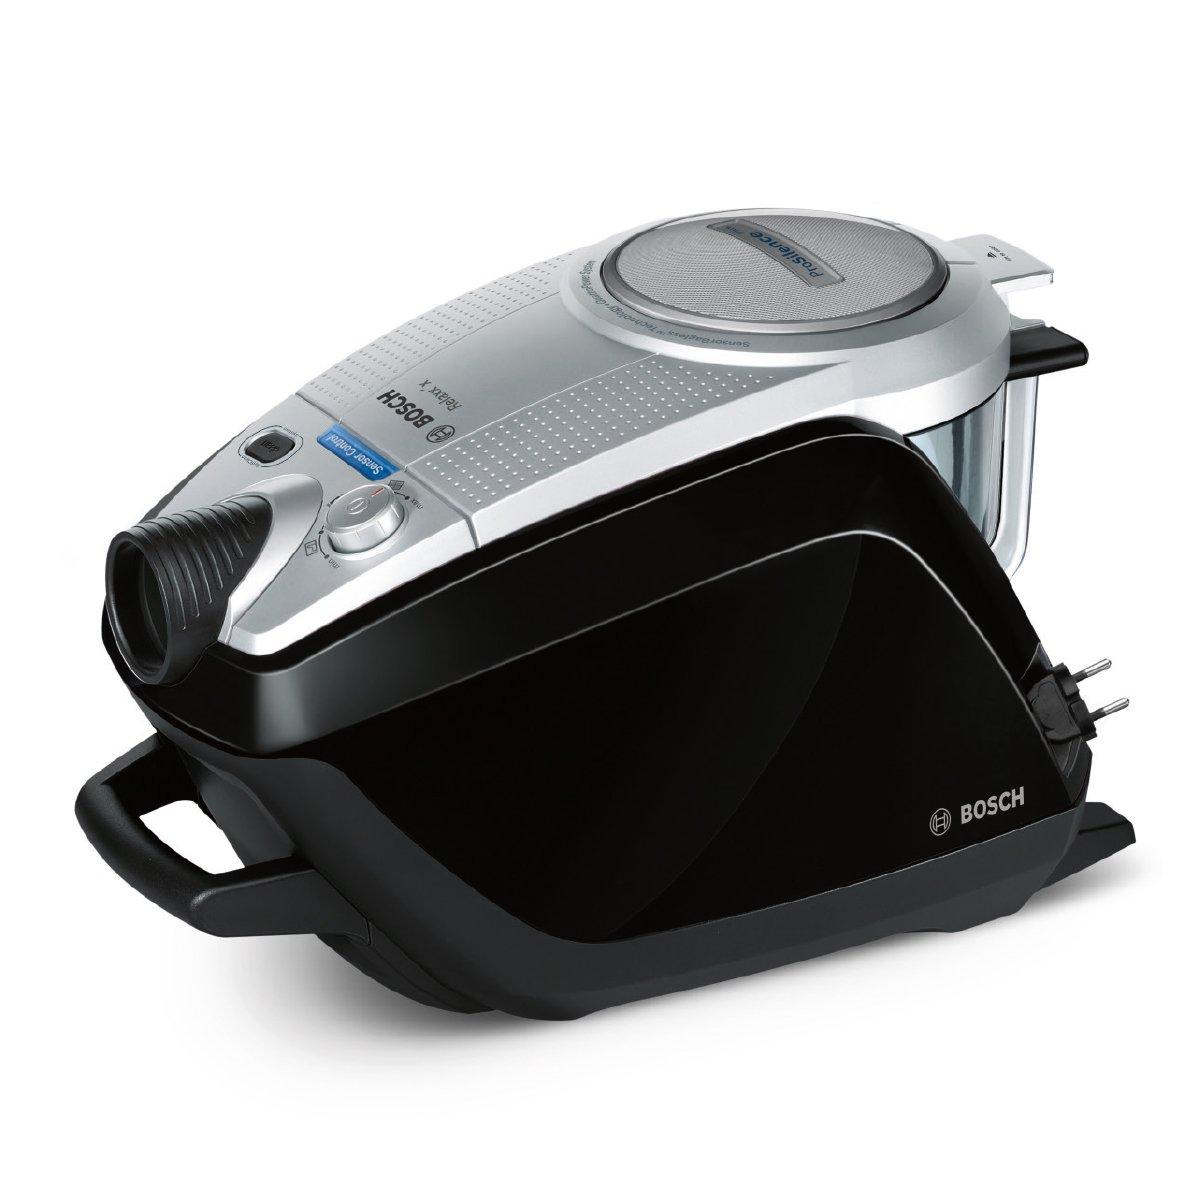 Bosch Aspiradora Relaxx x ProSilence Plus, negro: Amazon.es: Hogar